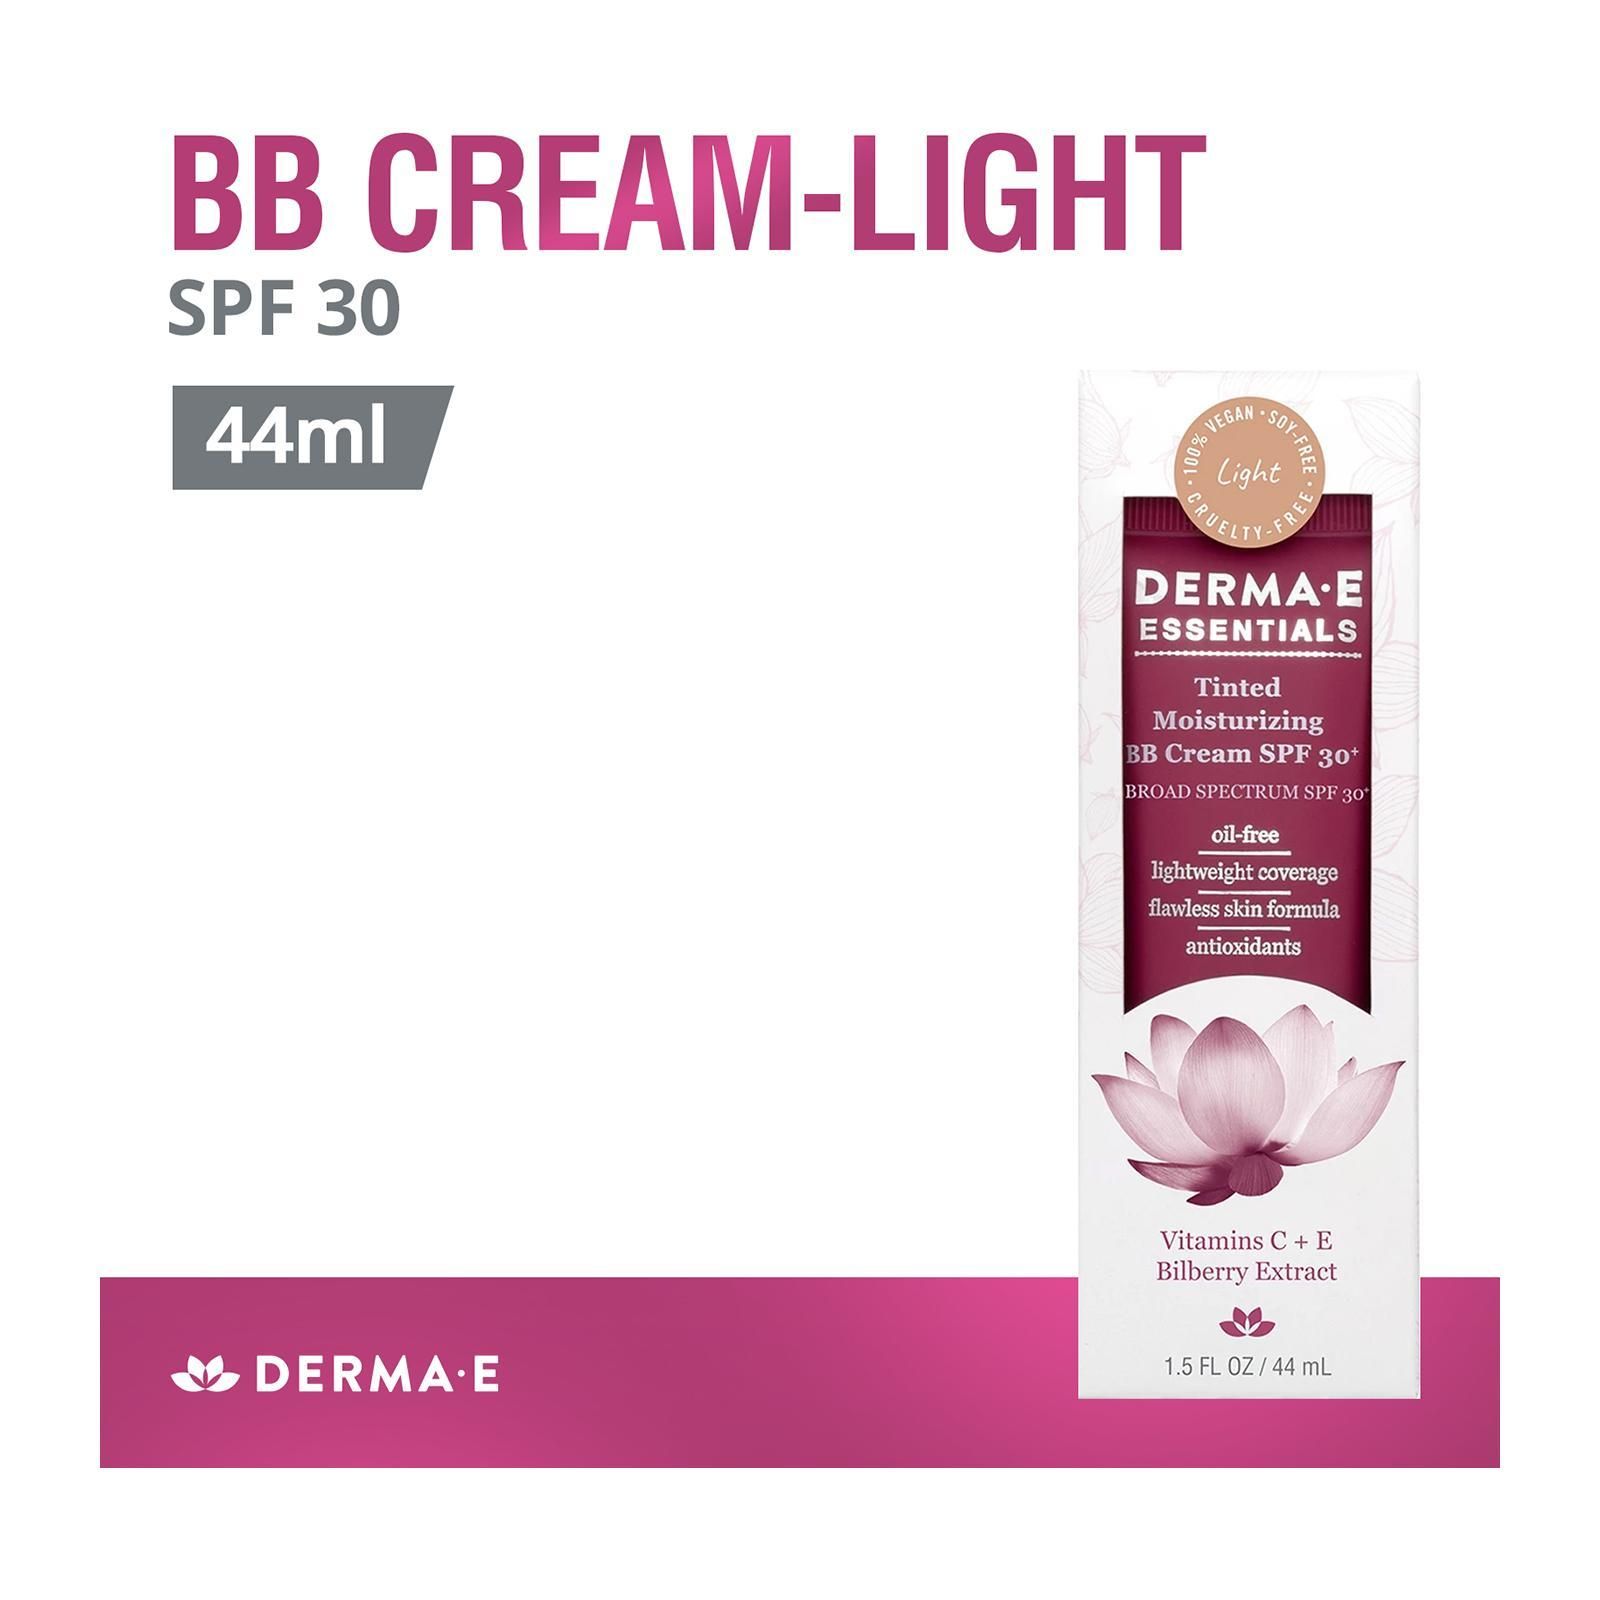 Derma E Light-Tinted Moisturizing BB Cream SPF 30+